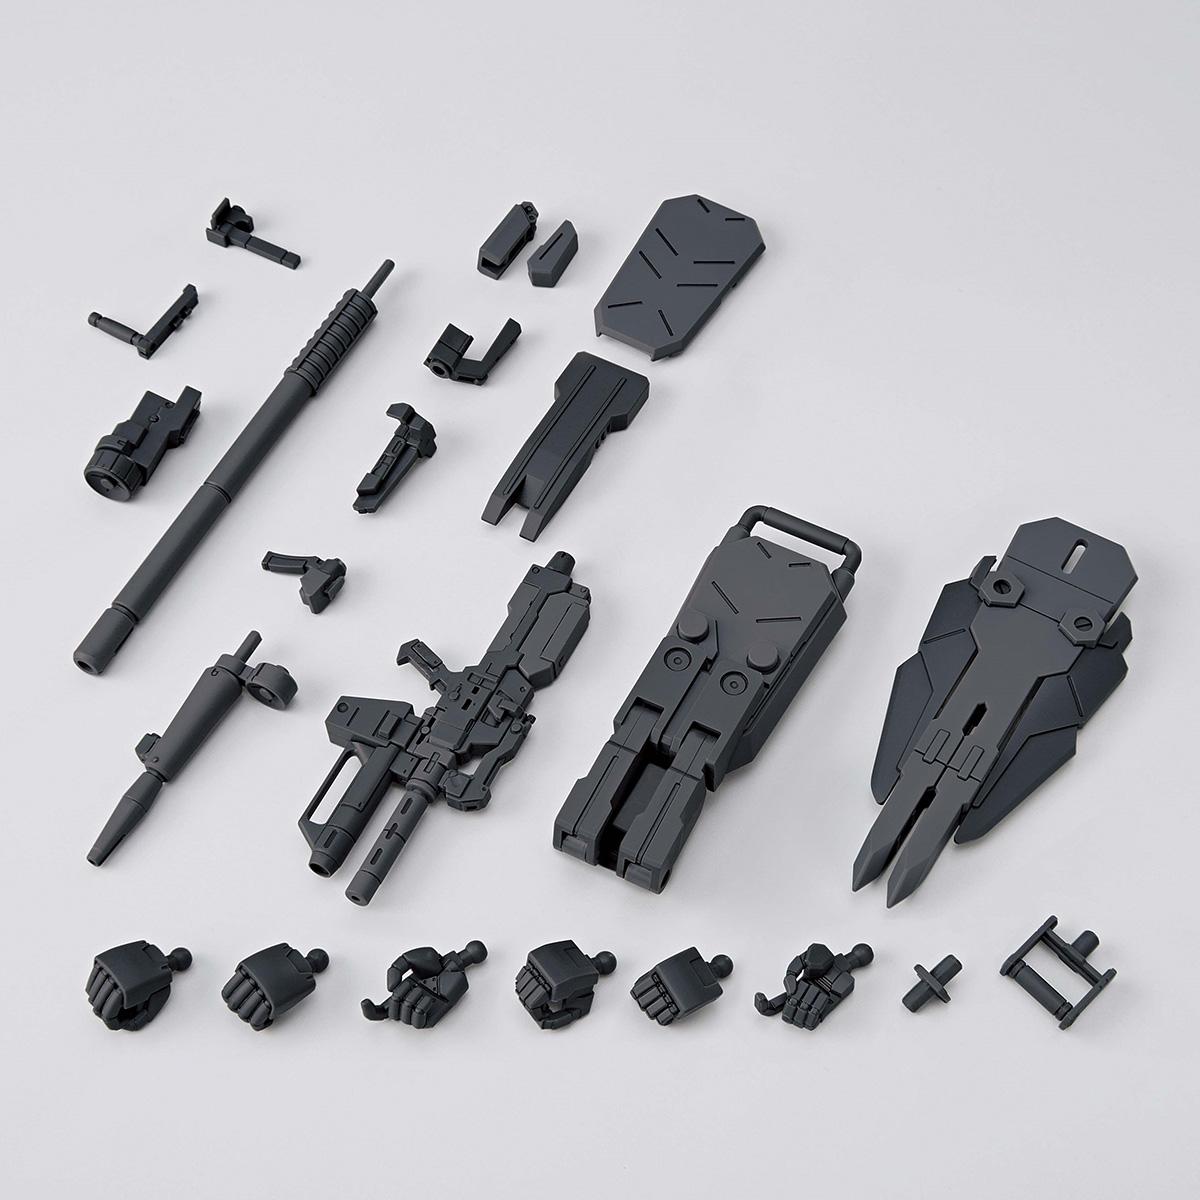 1/144 THE GUNDAM BASE LIMITED SYSTEM WEAPON KIT 003